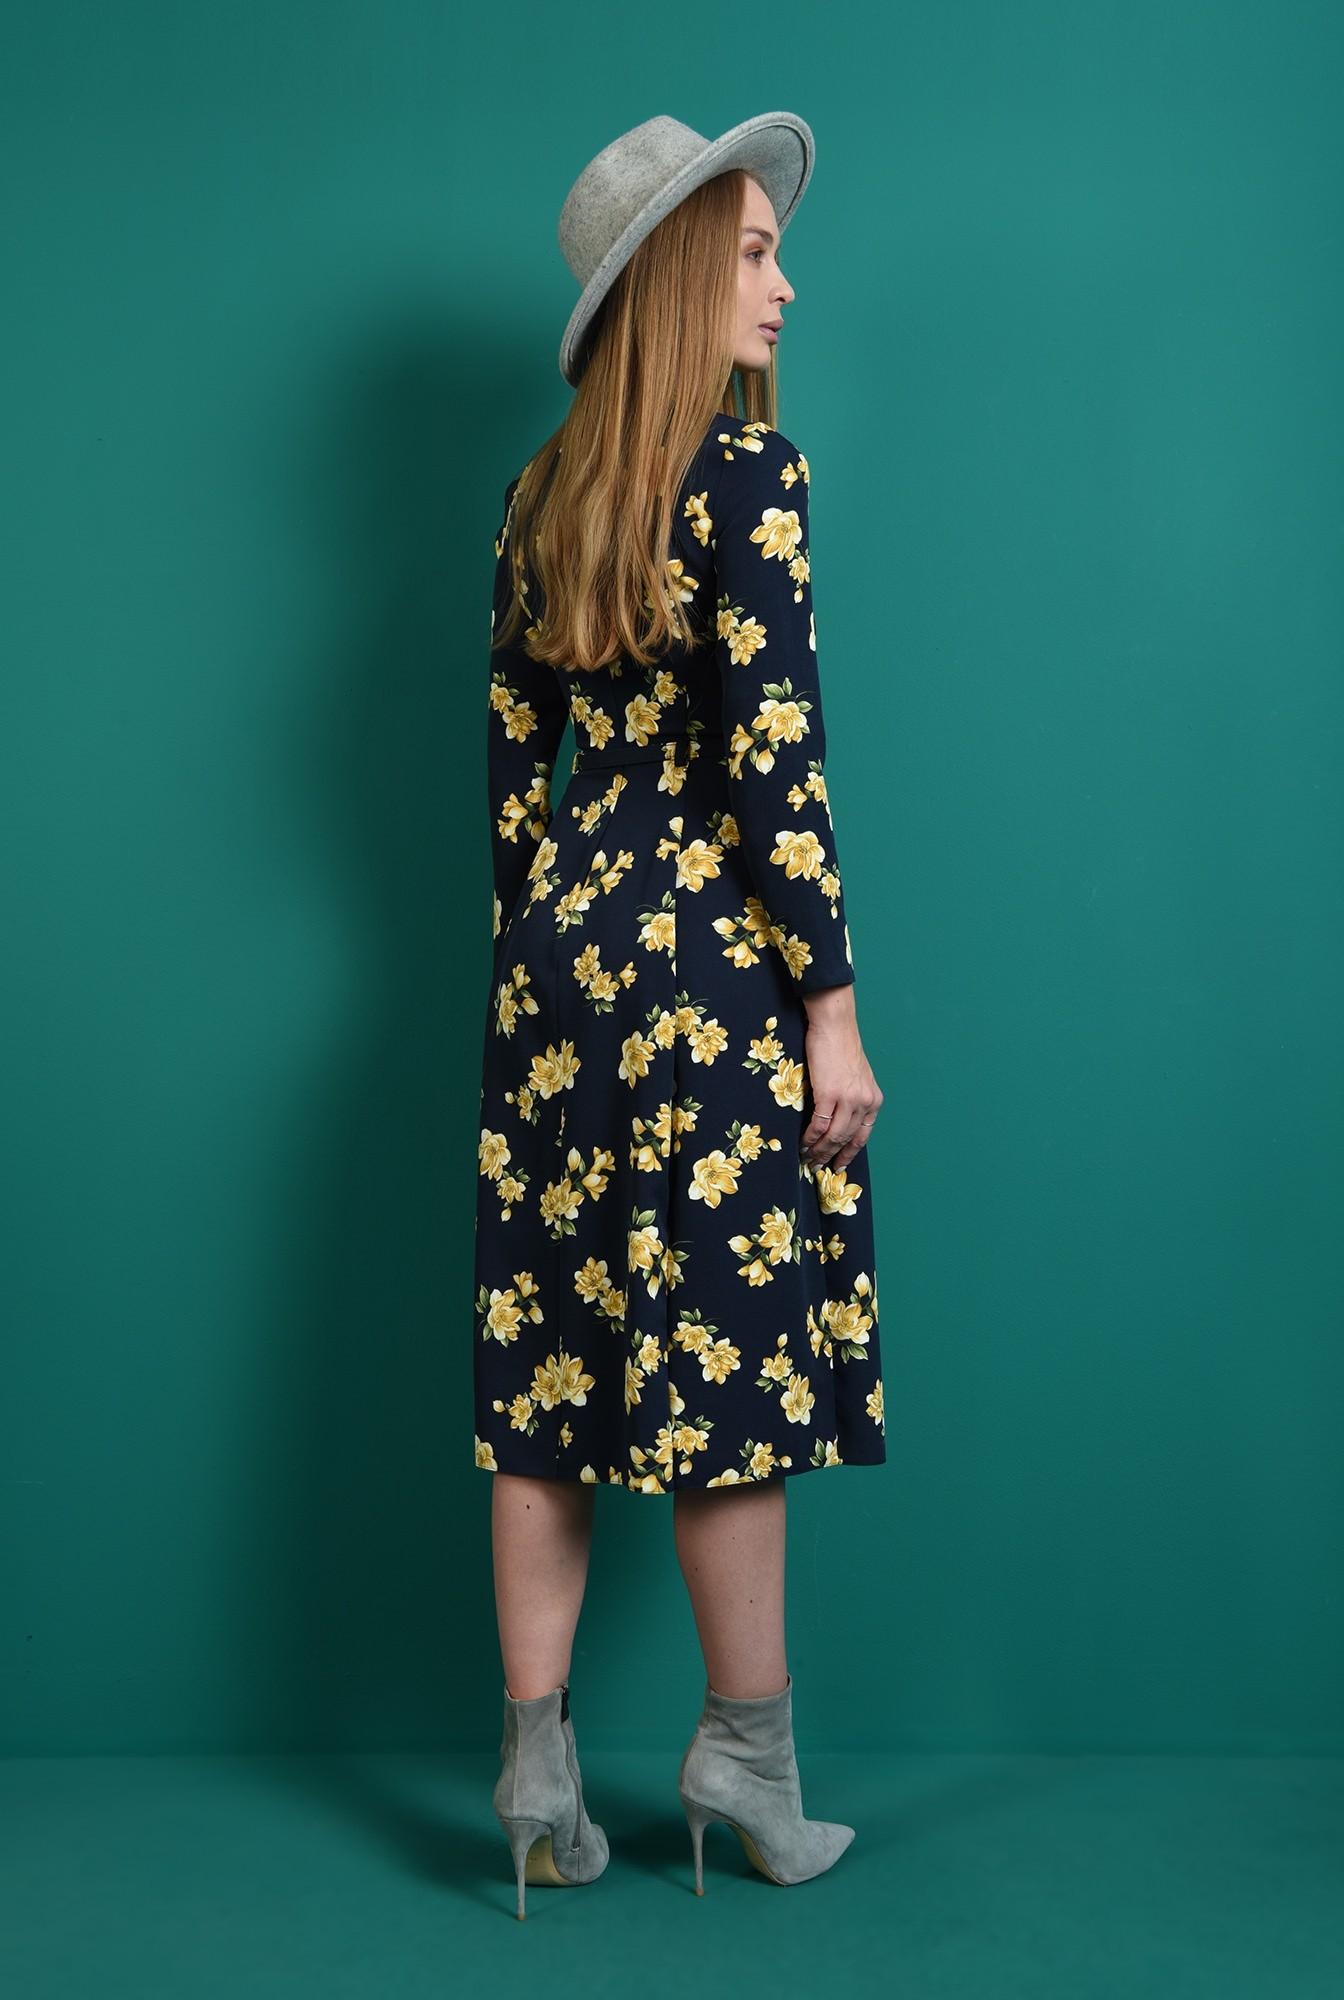 1 - rochie bleumarin, evazata, cu mptive florale